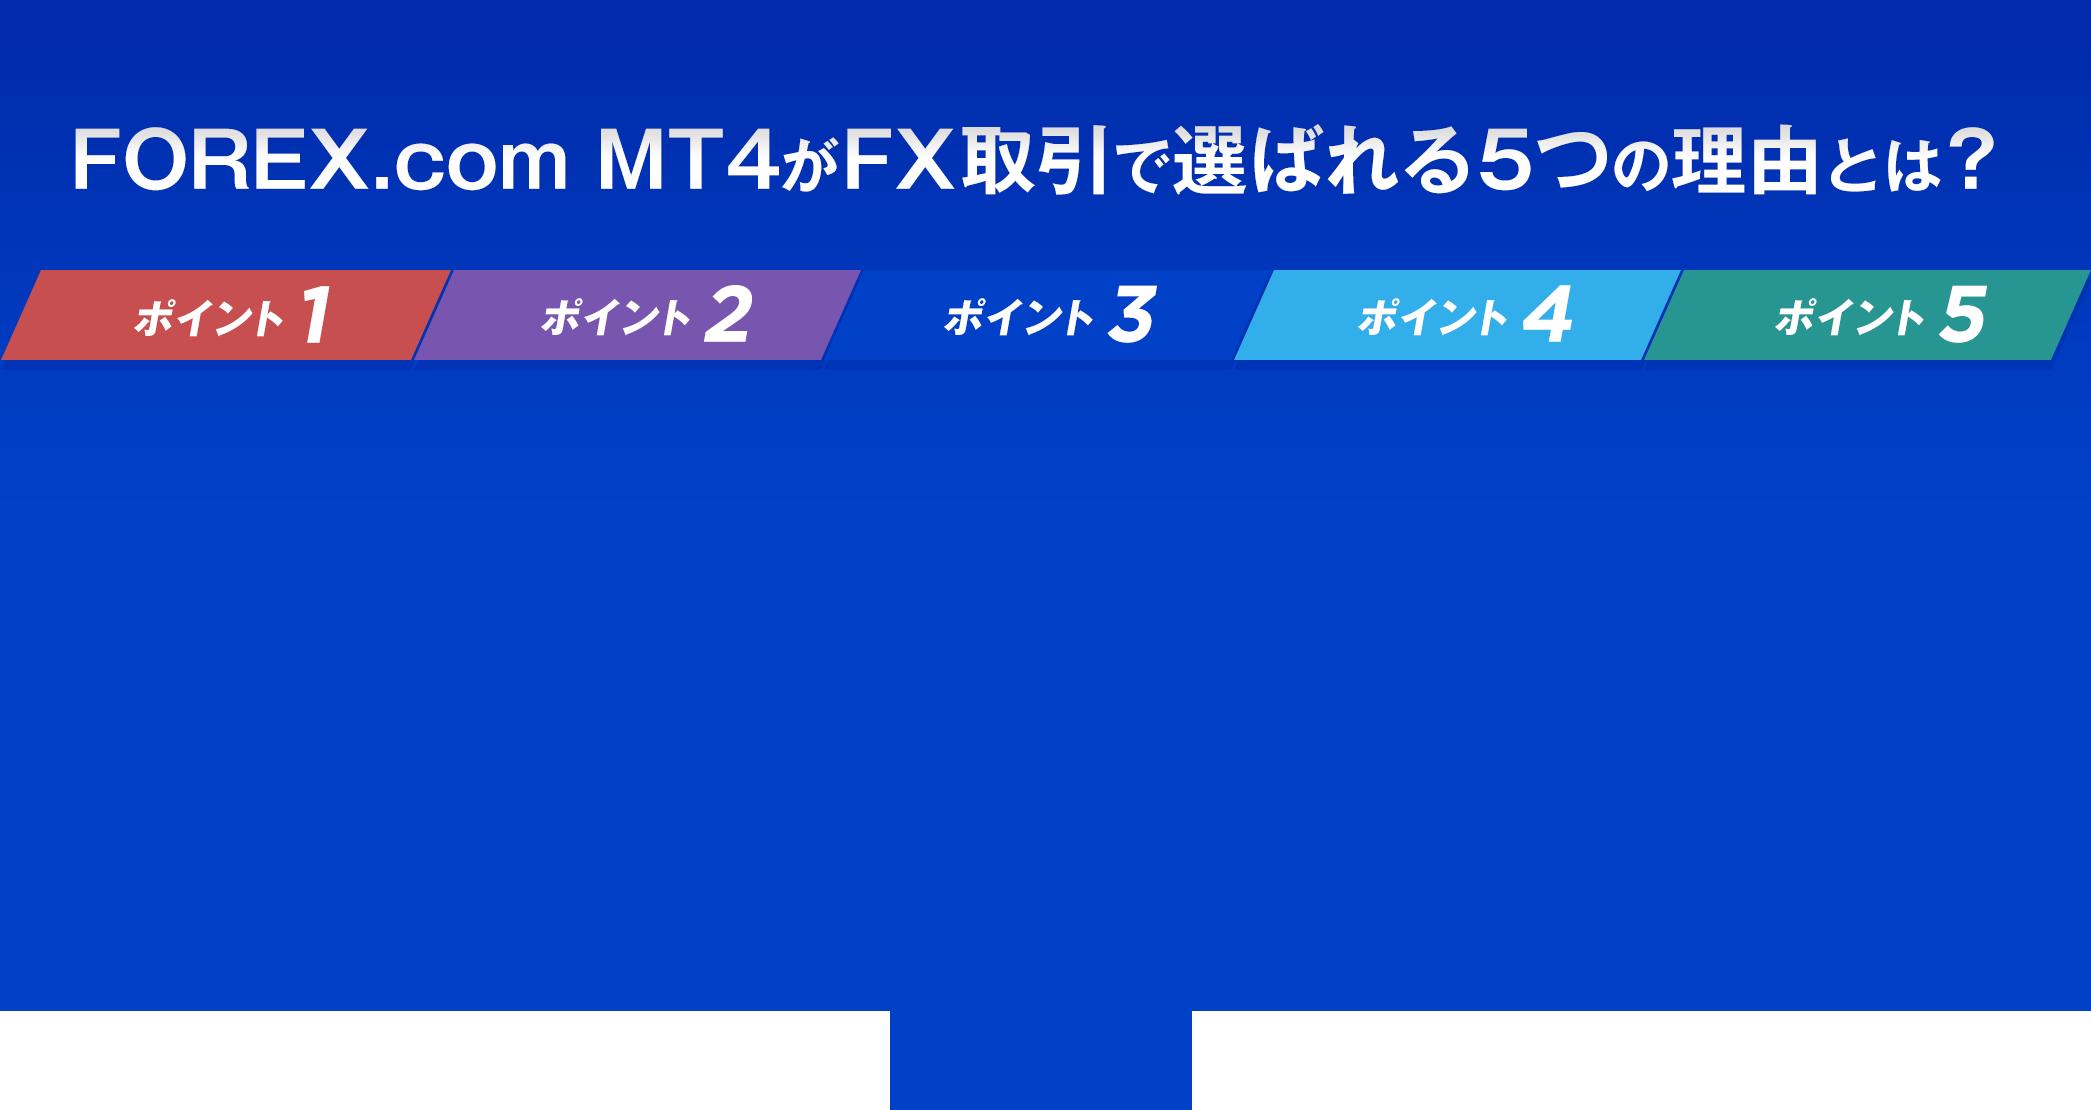 Forex.com mt4